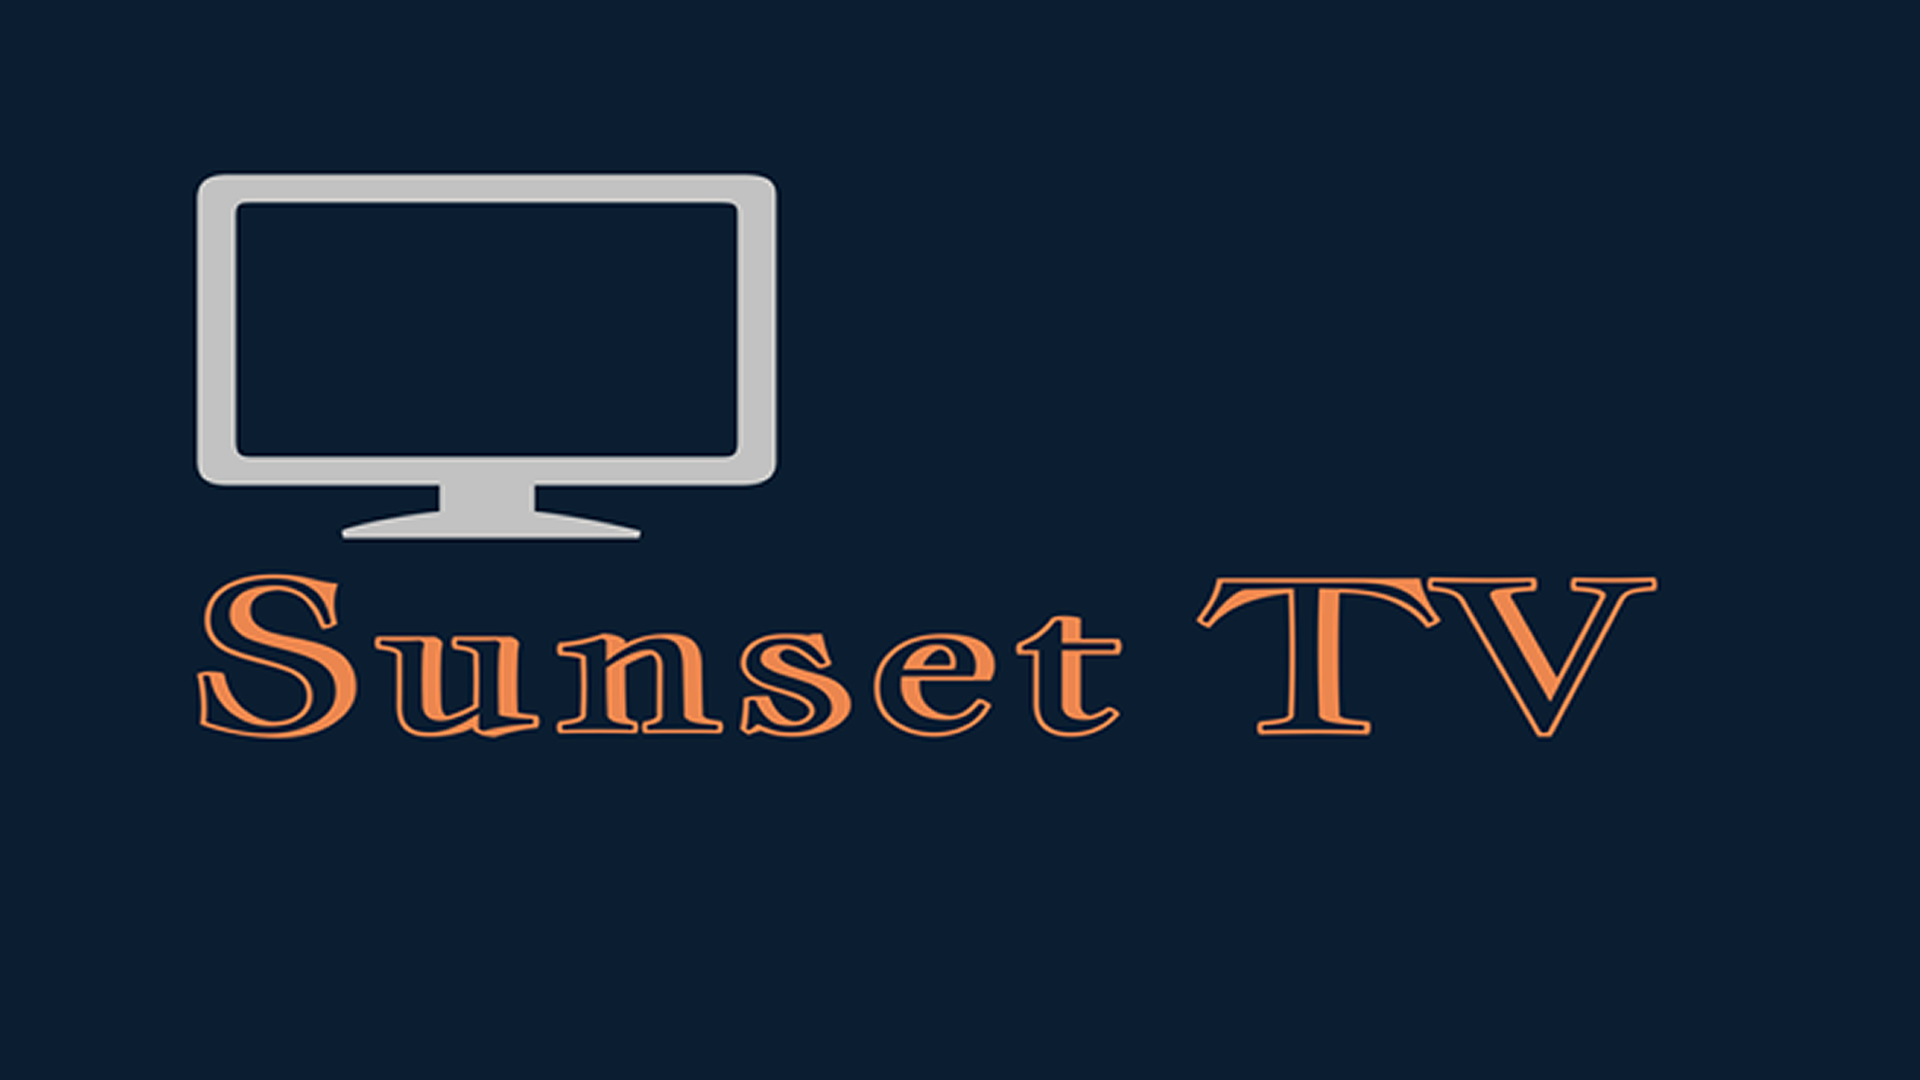 Sunset TV